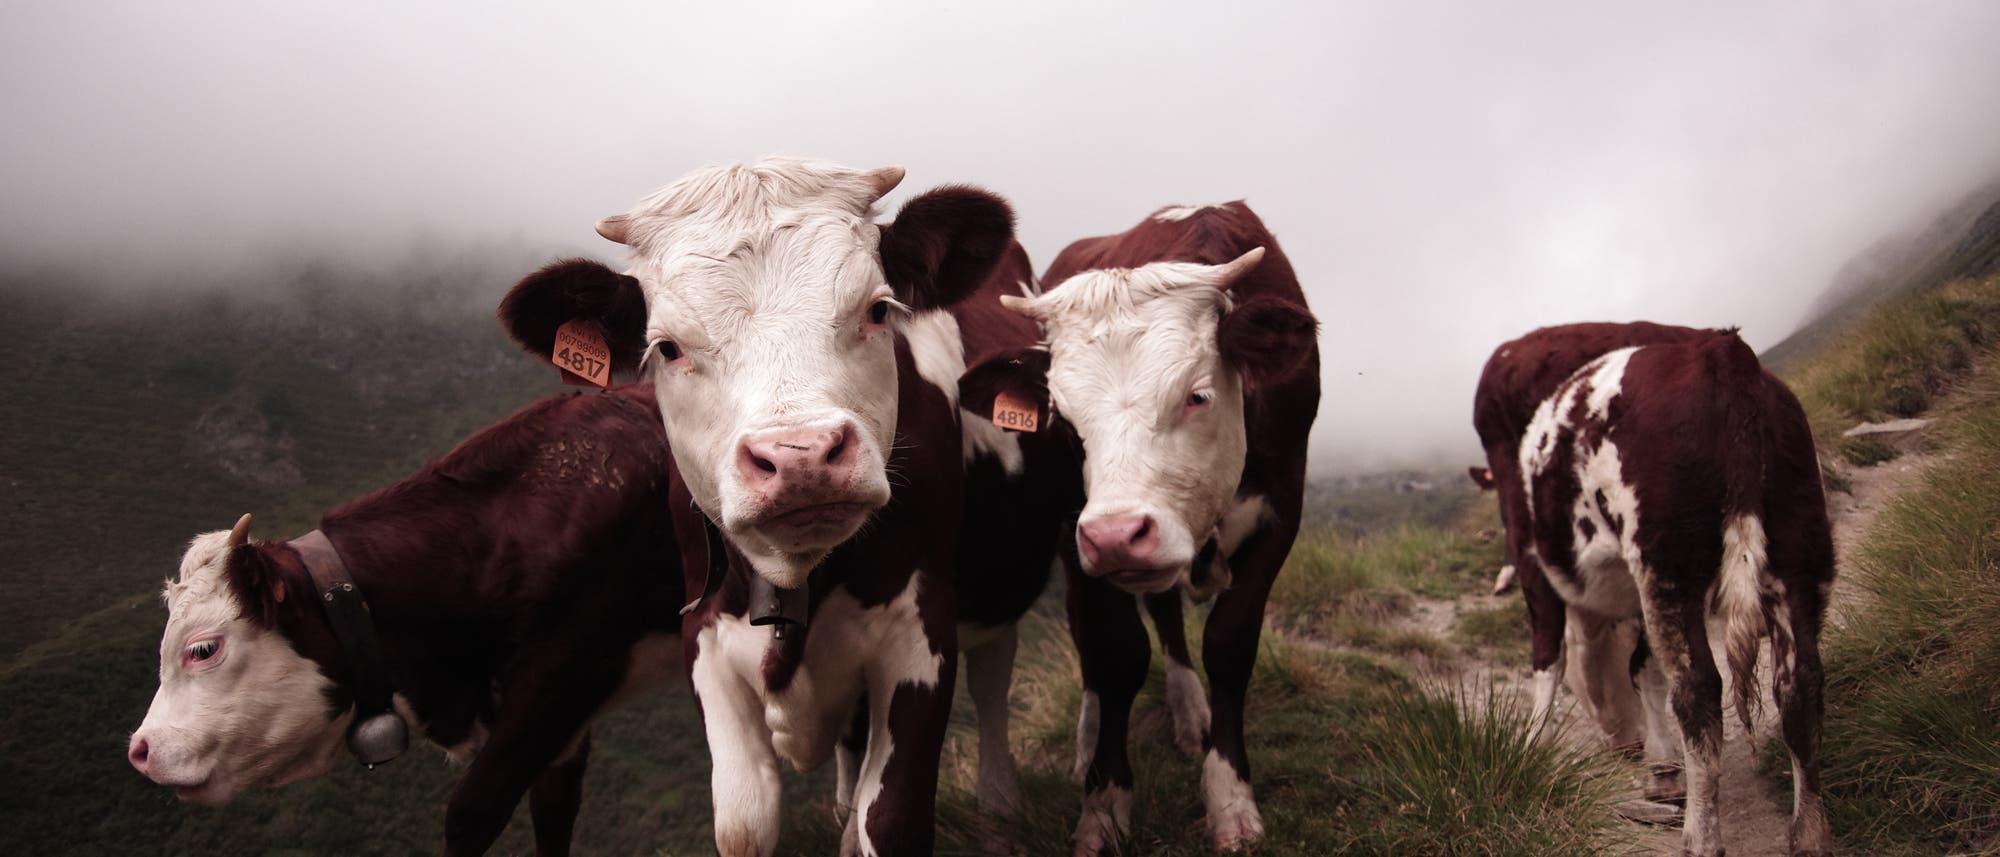 Kühe sind Herdentiere